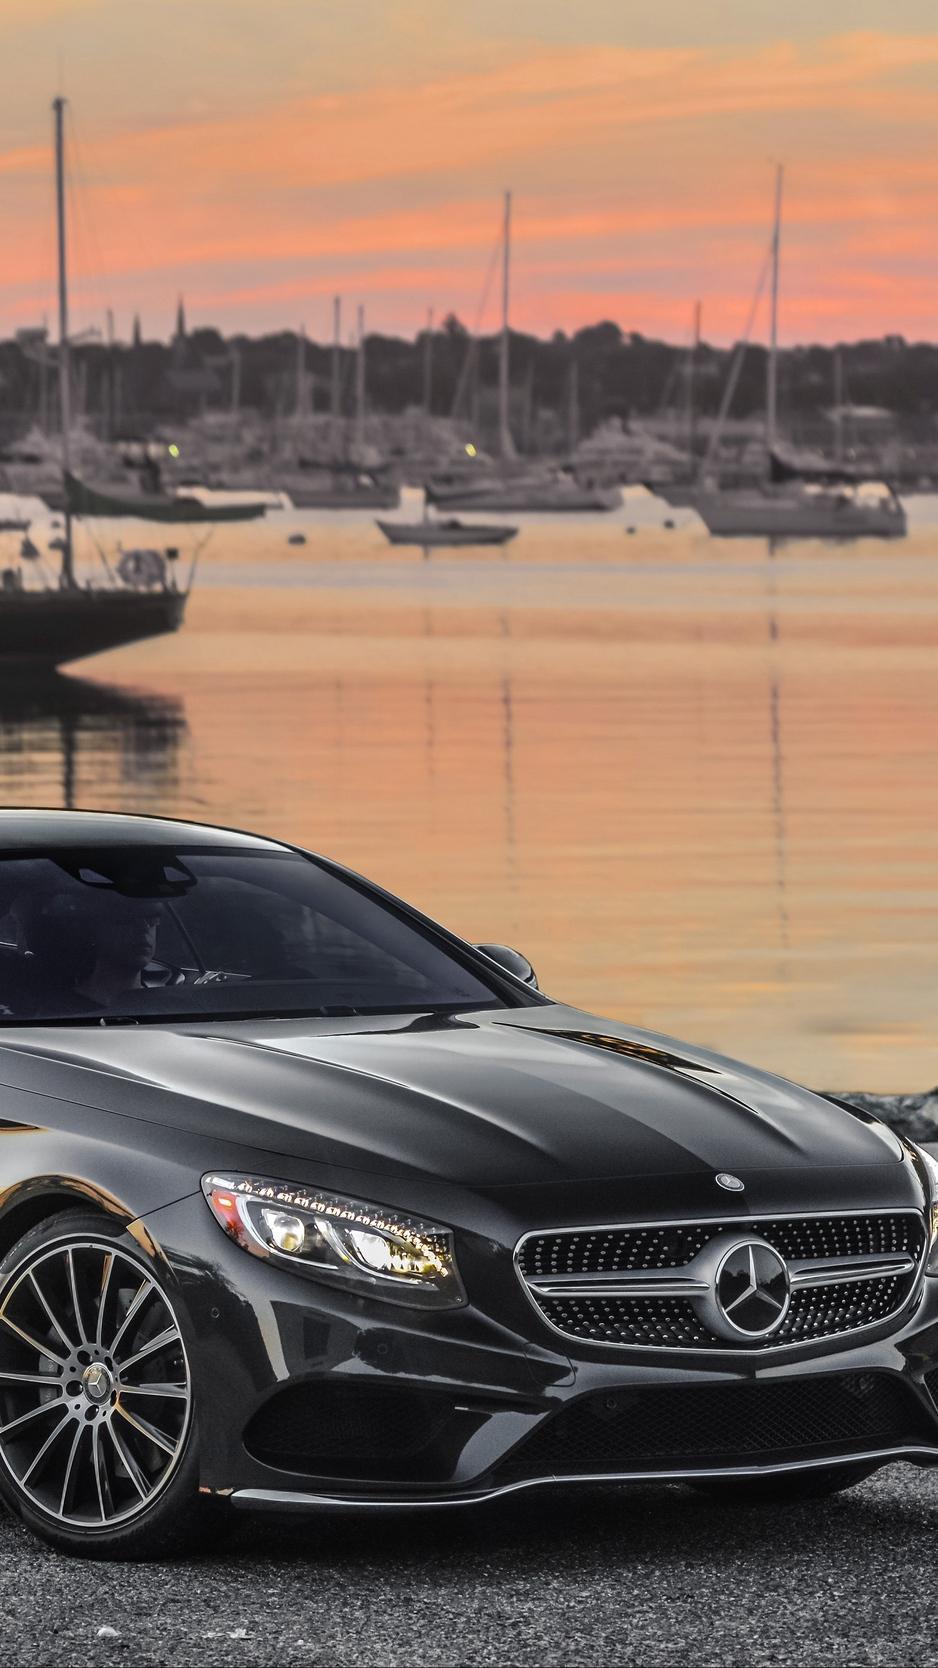 Mercedes A Class iPhone Wallpapers   Wallpaper Cave